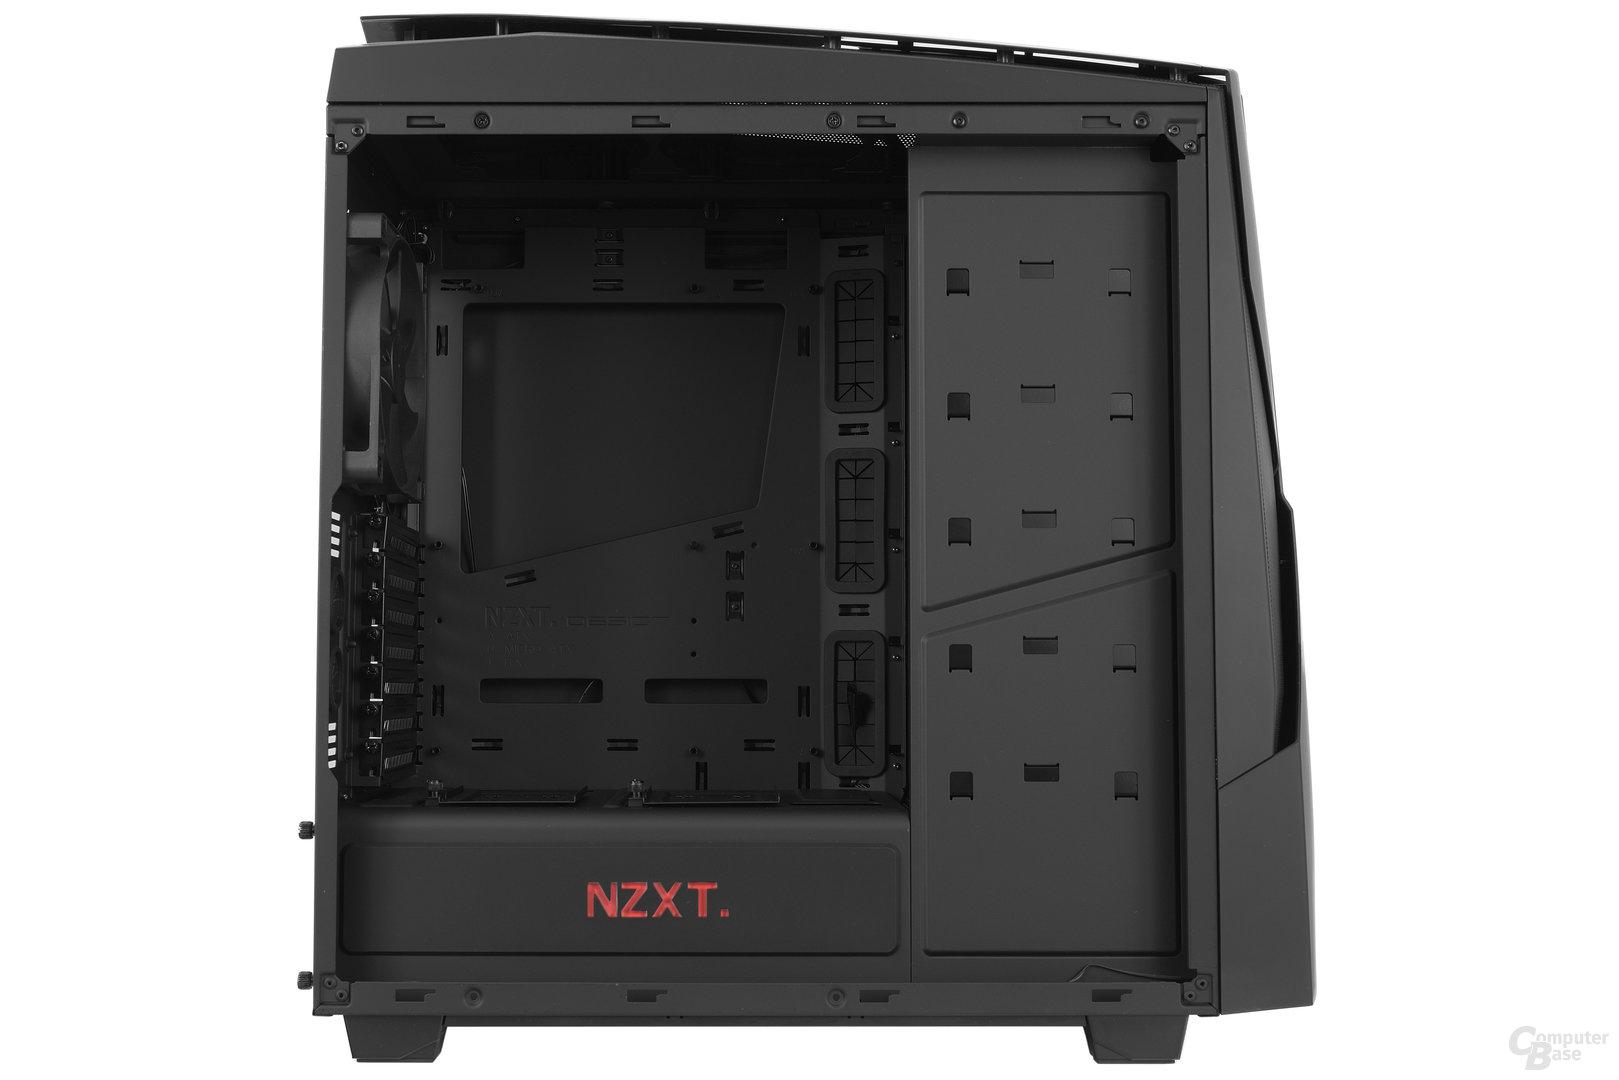 NZXT Noctis 450 – Innenraumansicht